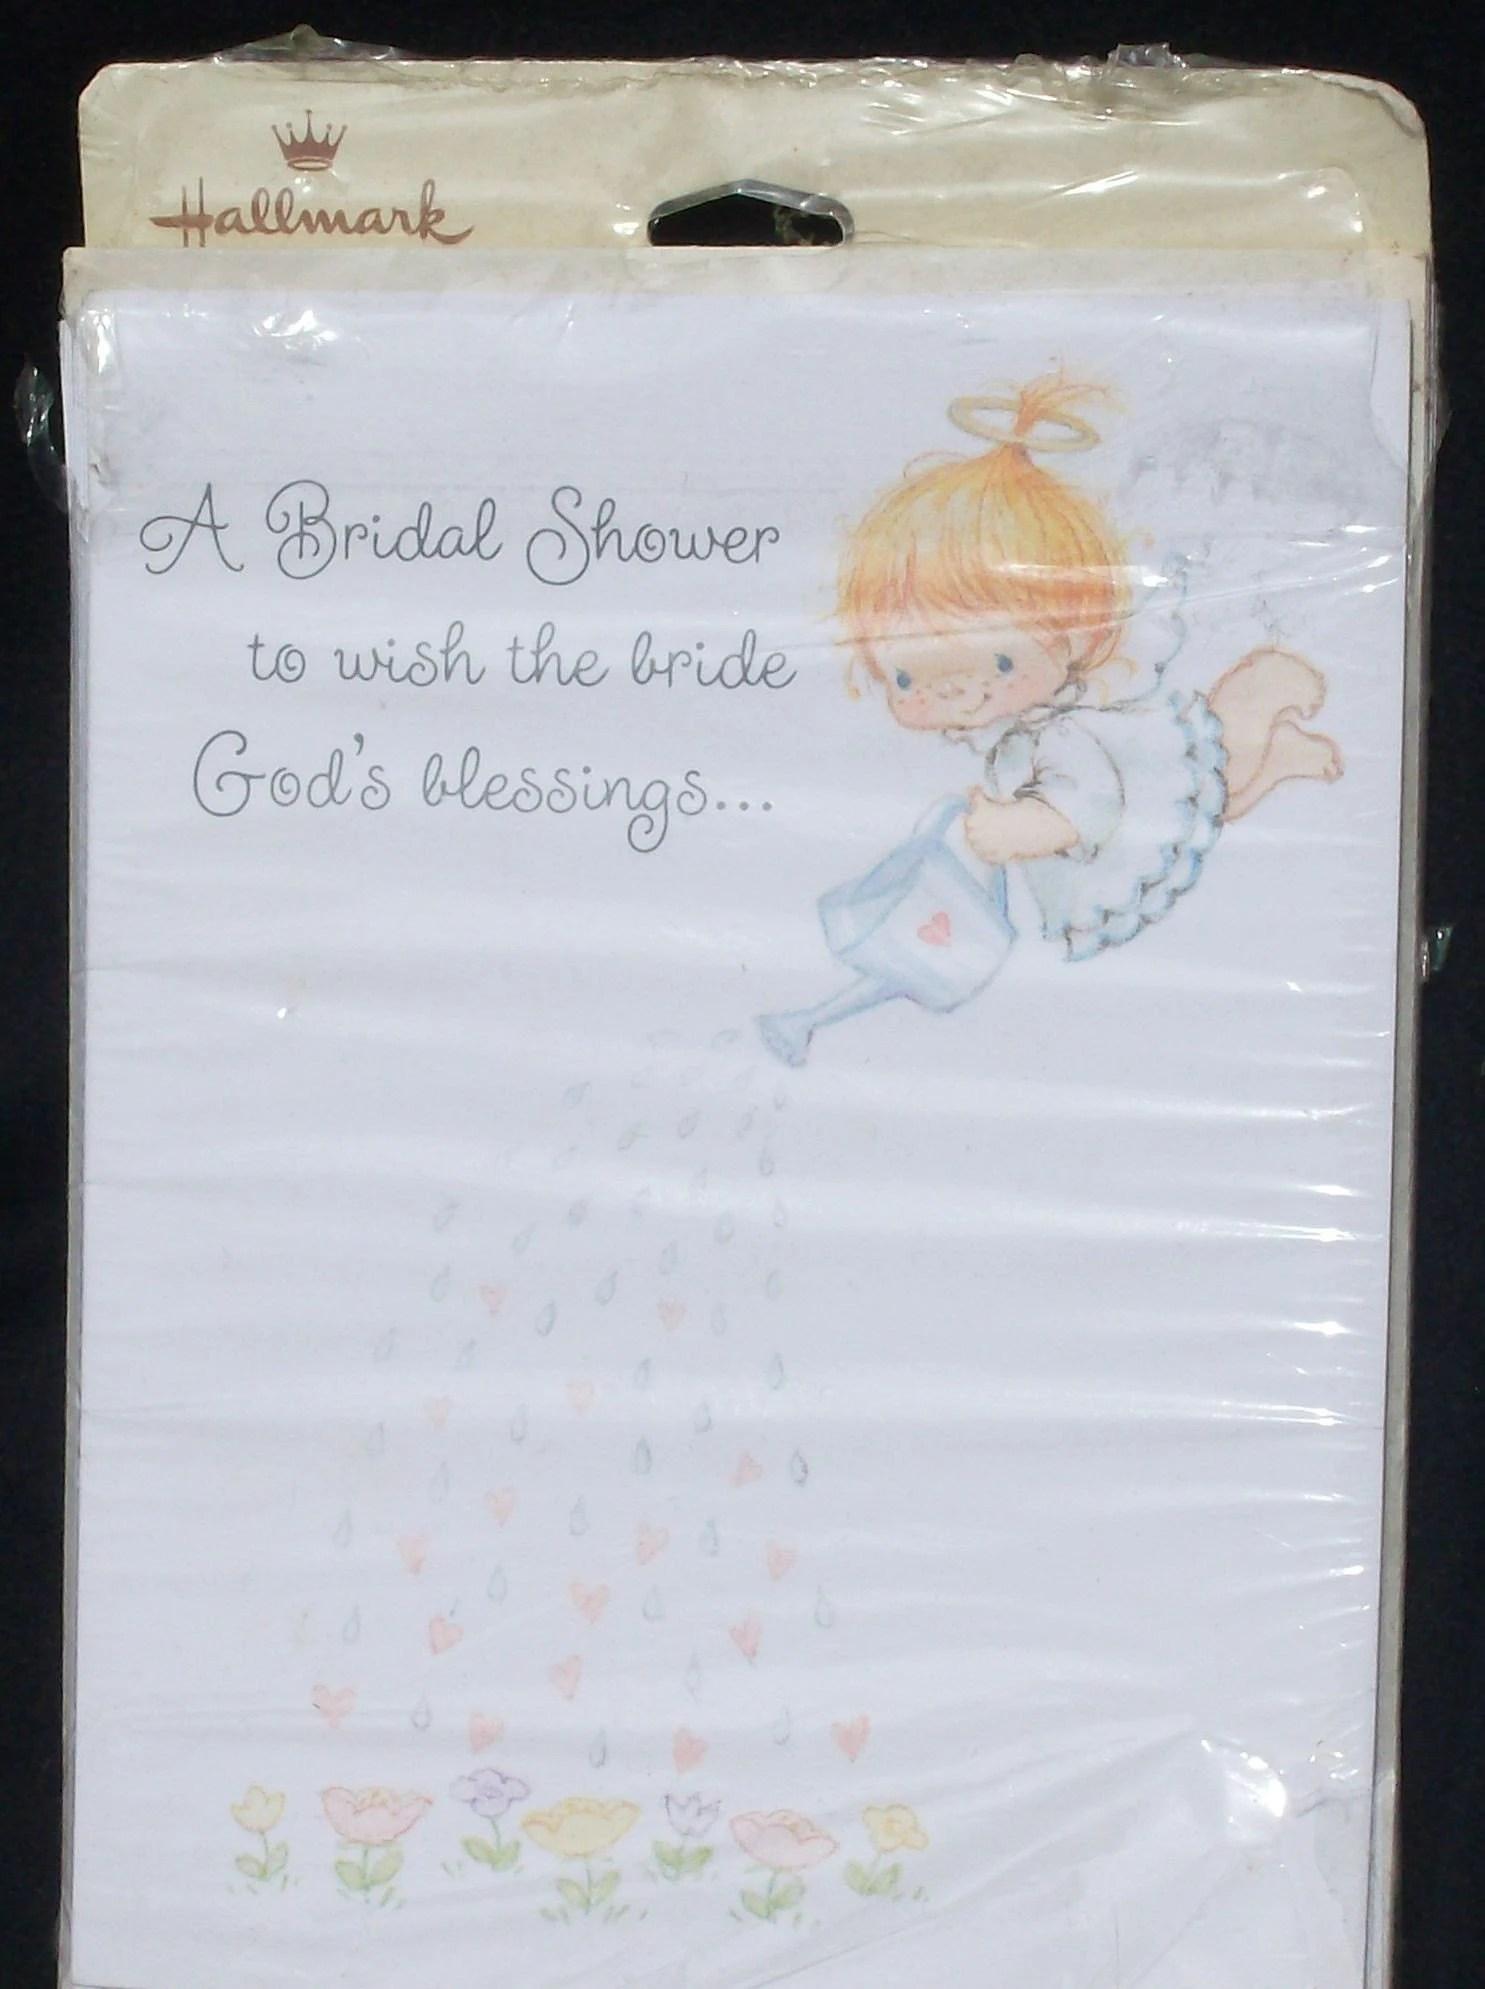 Hallmark Bridal Shower Invitations 8 Count